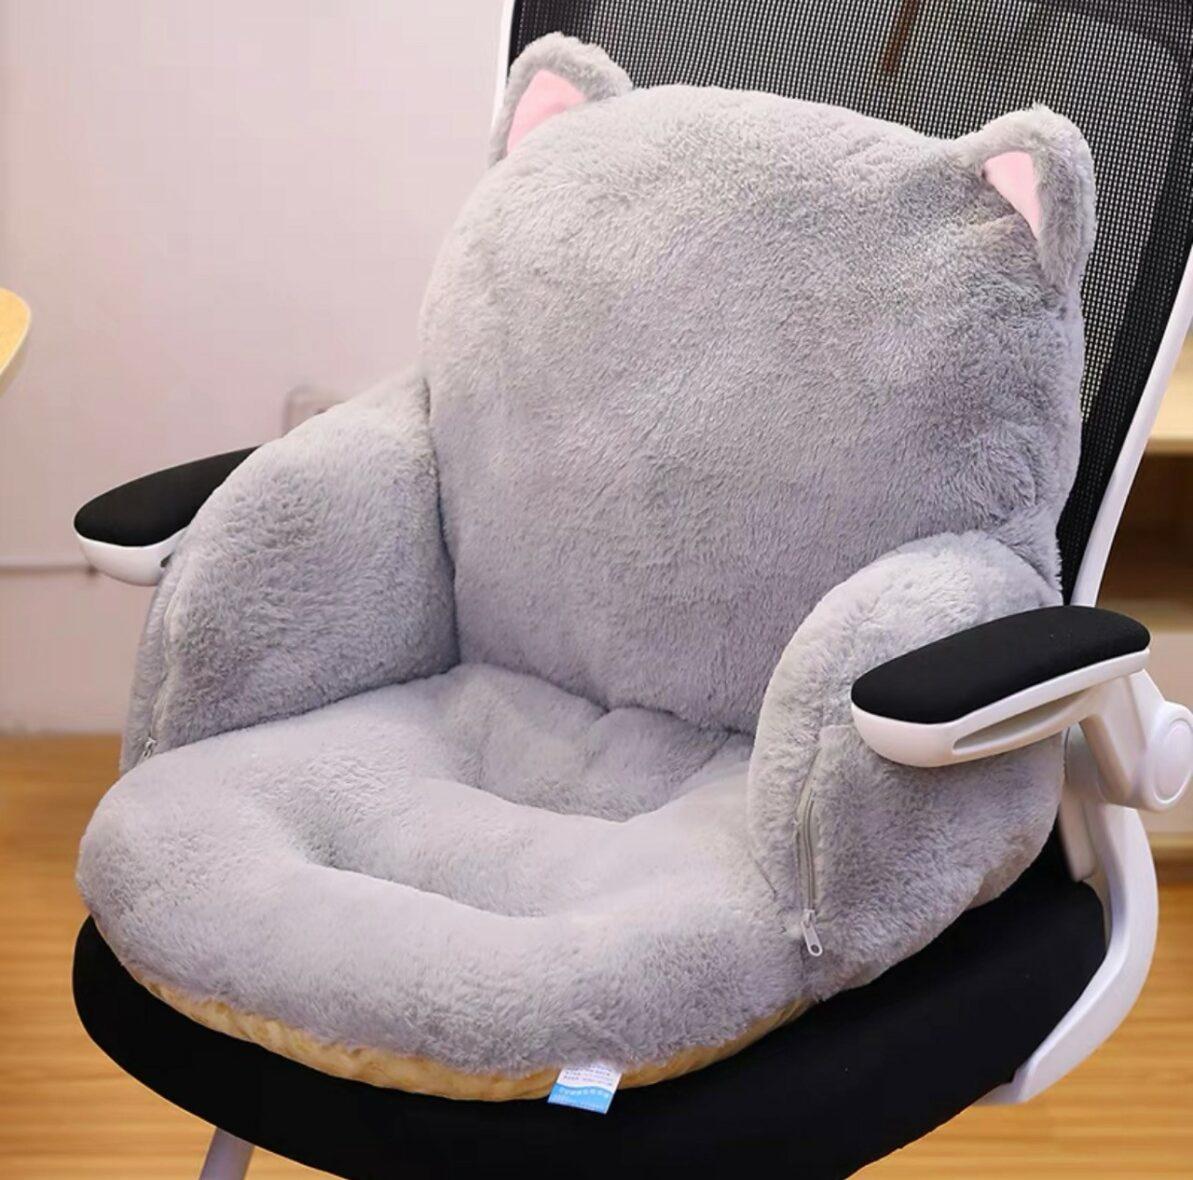 Kawaii Animal Ears Seat Cushion – Special Edition